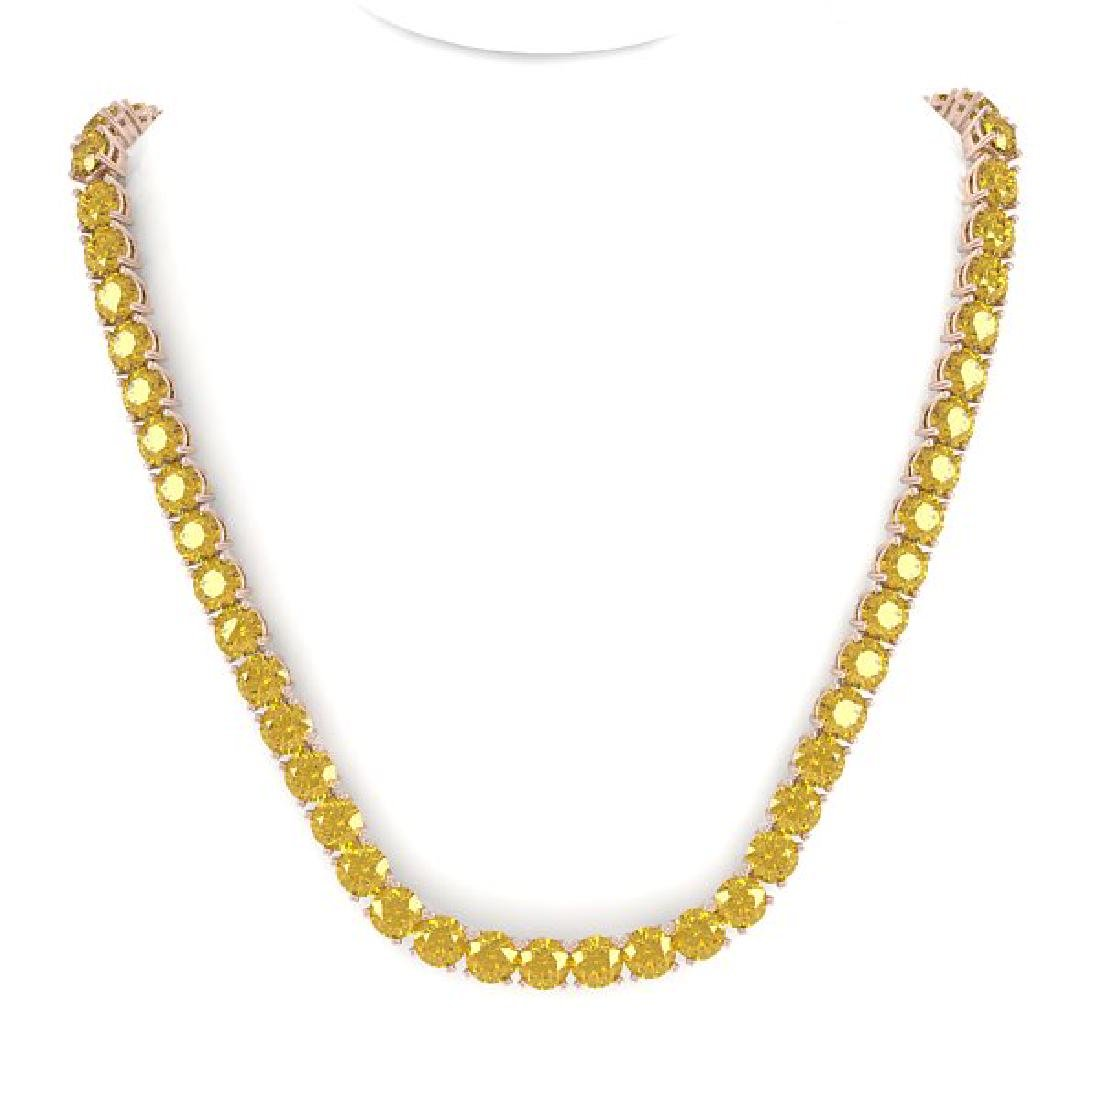 30 CTW Certified Fancy Yellow SI Diamond Necklace 18K - 3